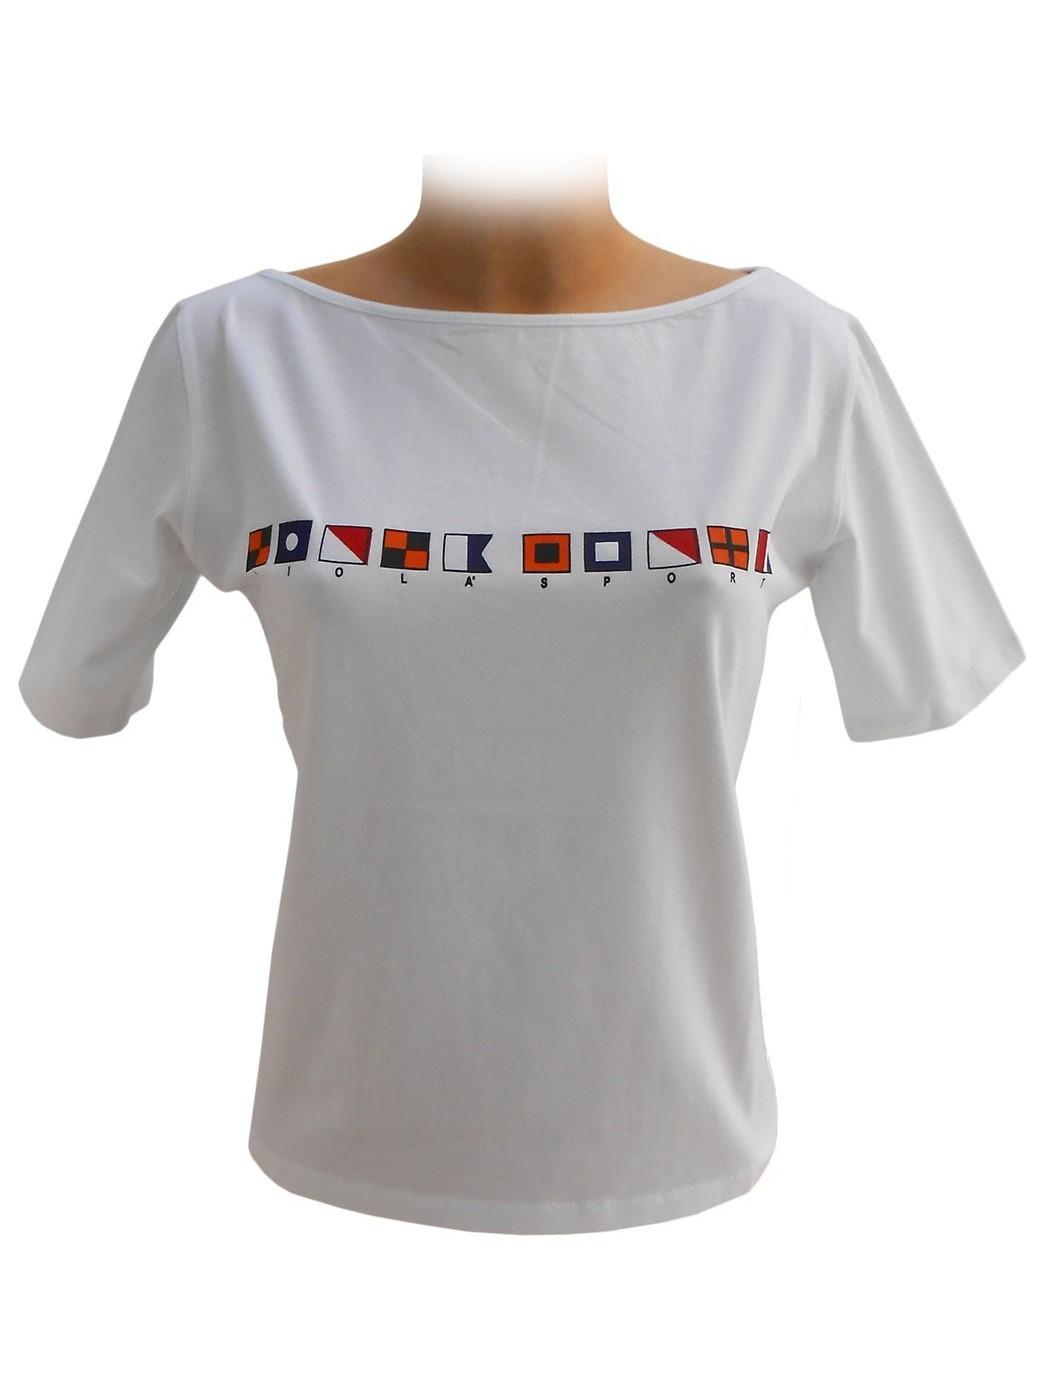 Liolà Sport t-shirt